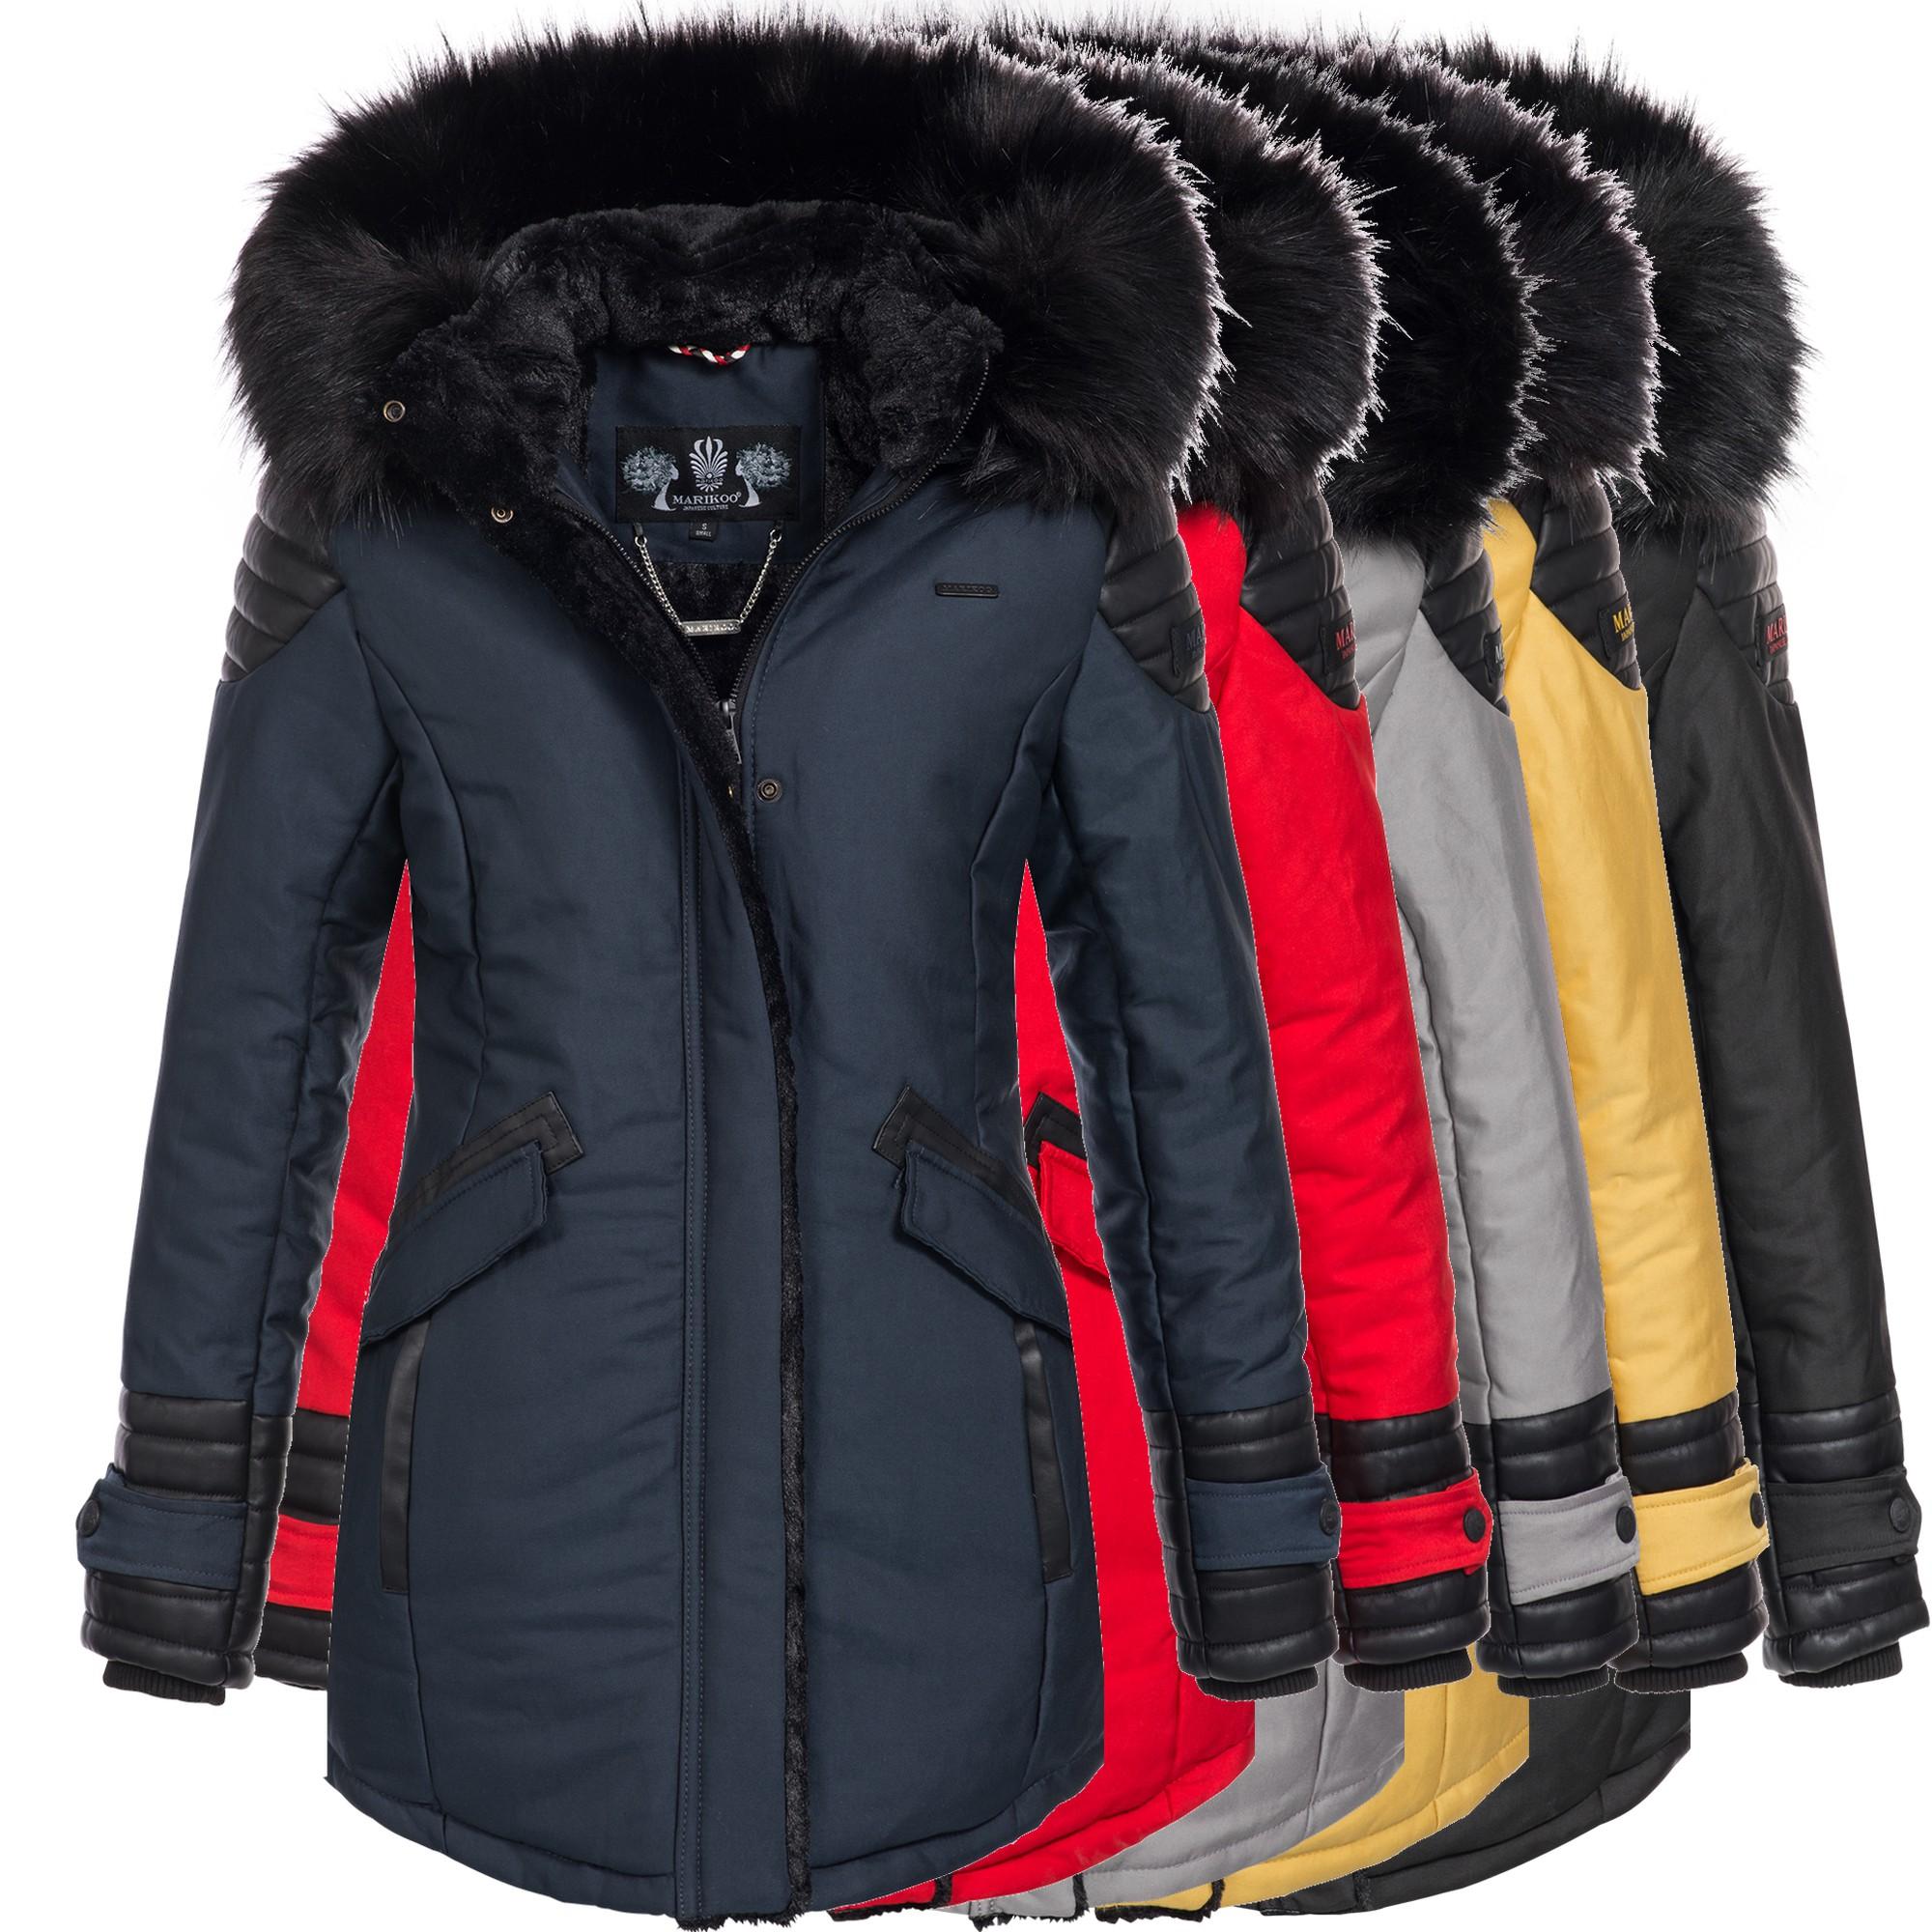 zauberfee damen mantel wintermantel jacke parka grau gr m. Black Bedroom Furniture Sets. Home Design Ideas